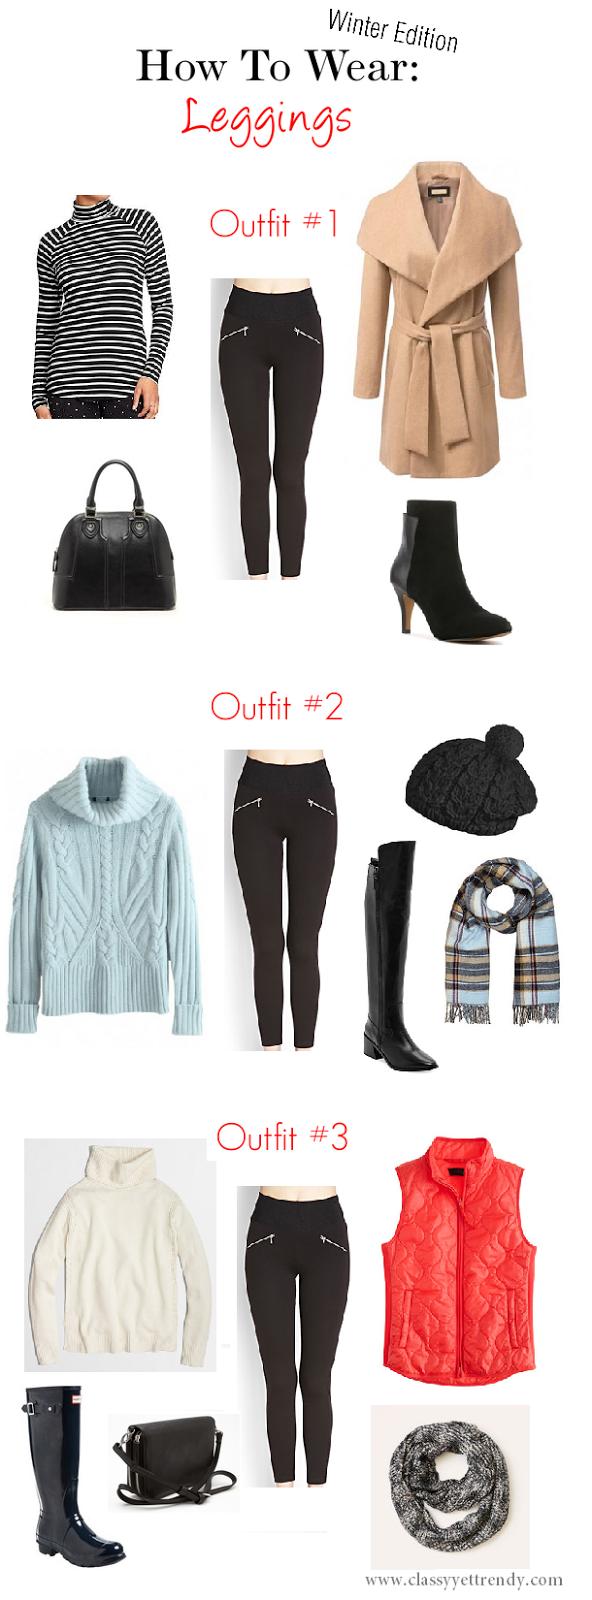 How To Wear Leggings 3 Ways , Classy Yet Trendy